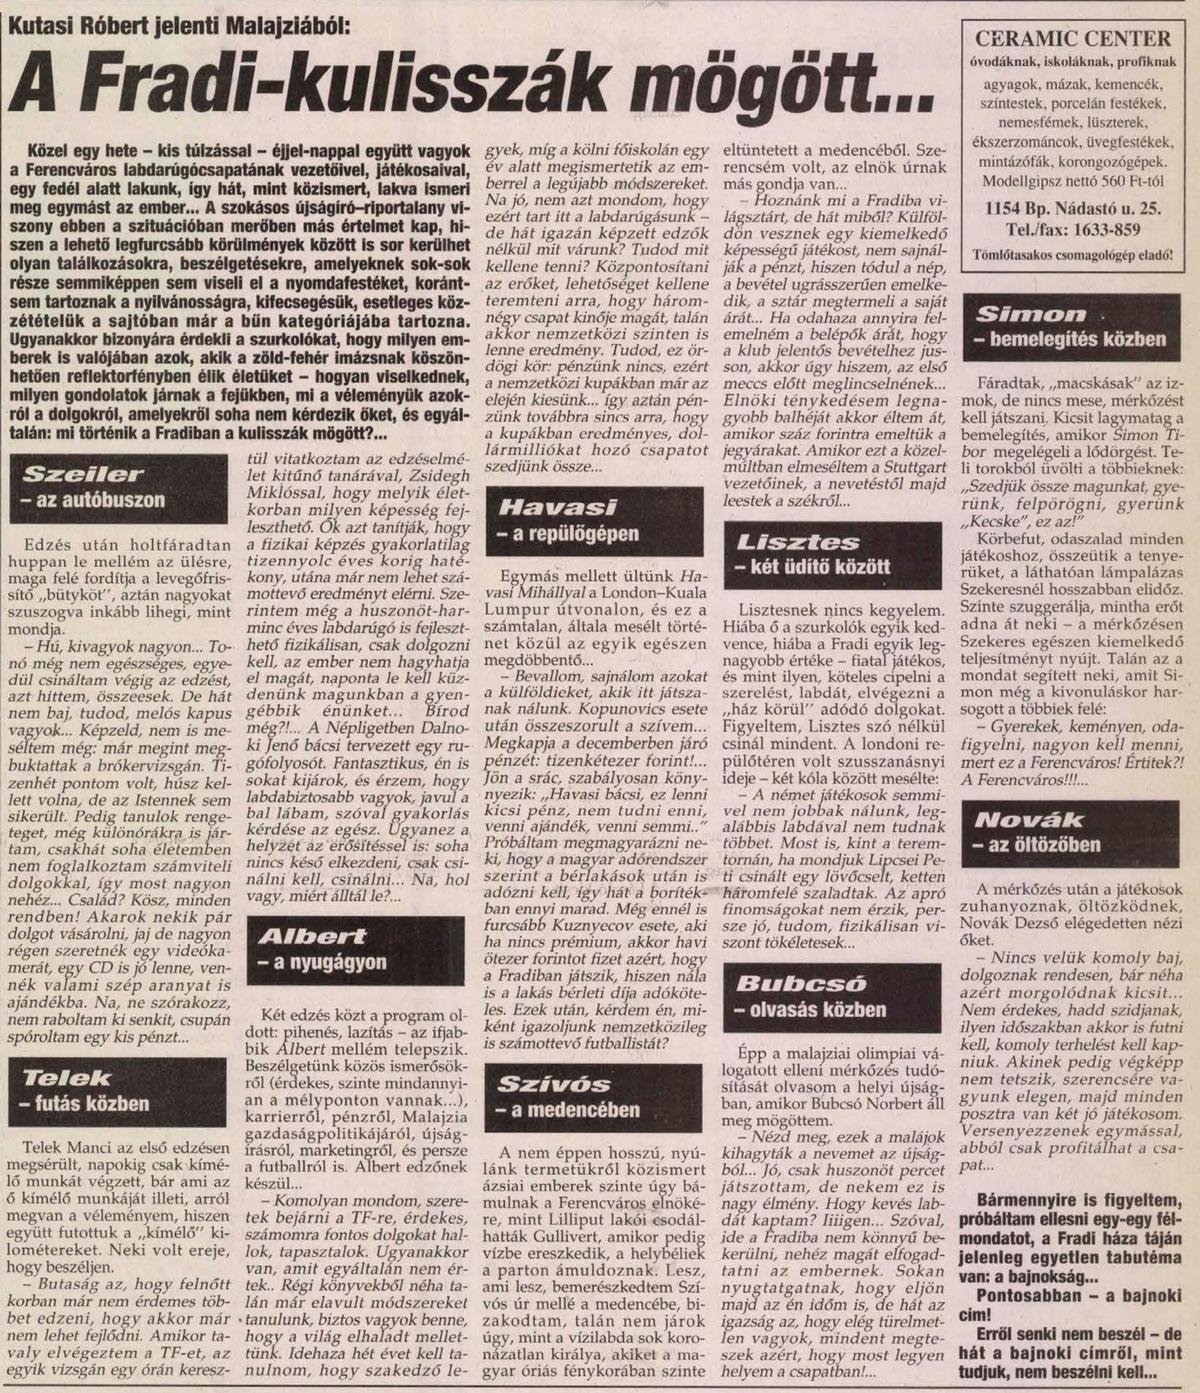 NS-19950122-03-199501